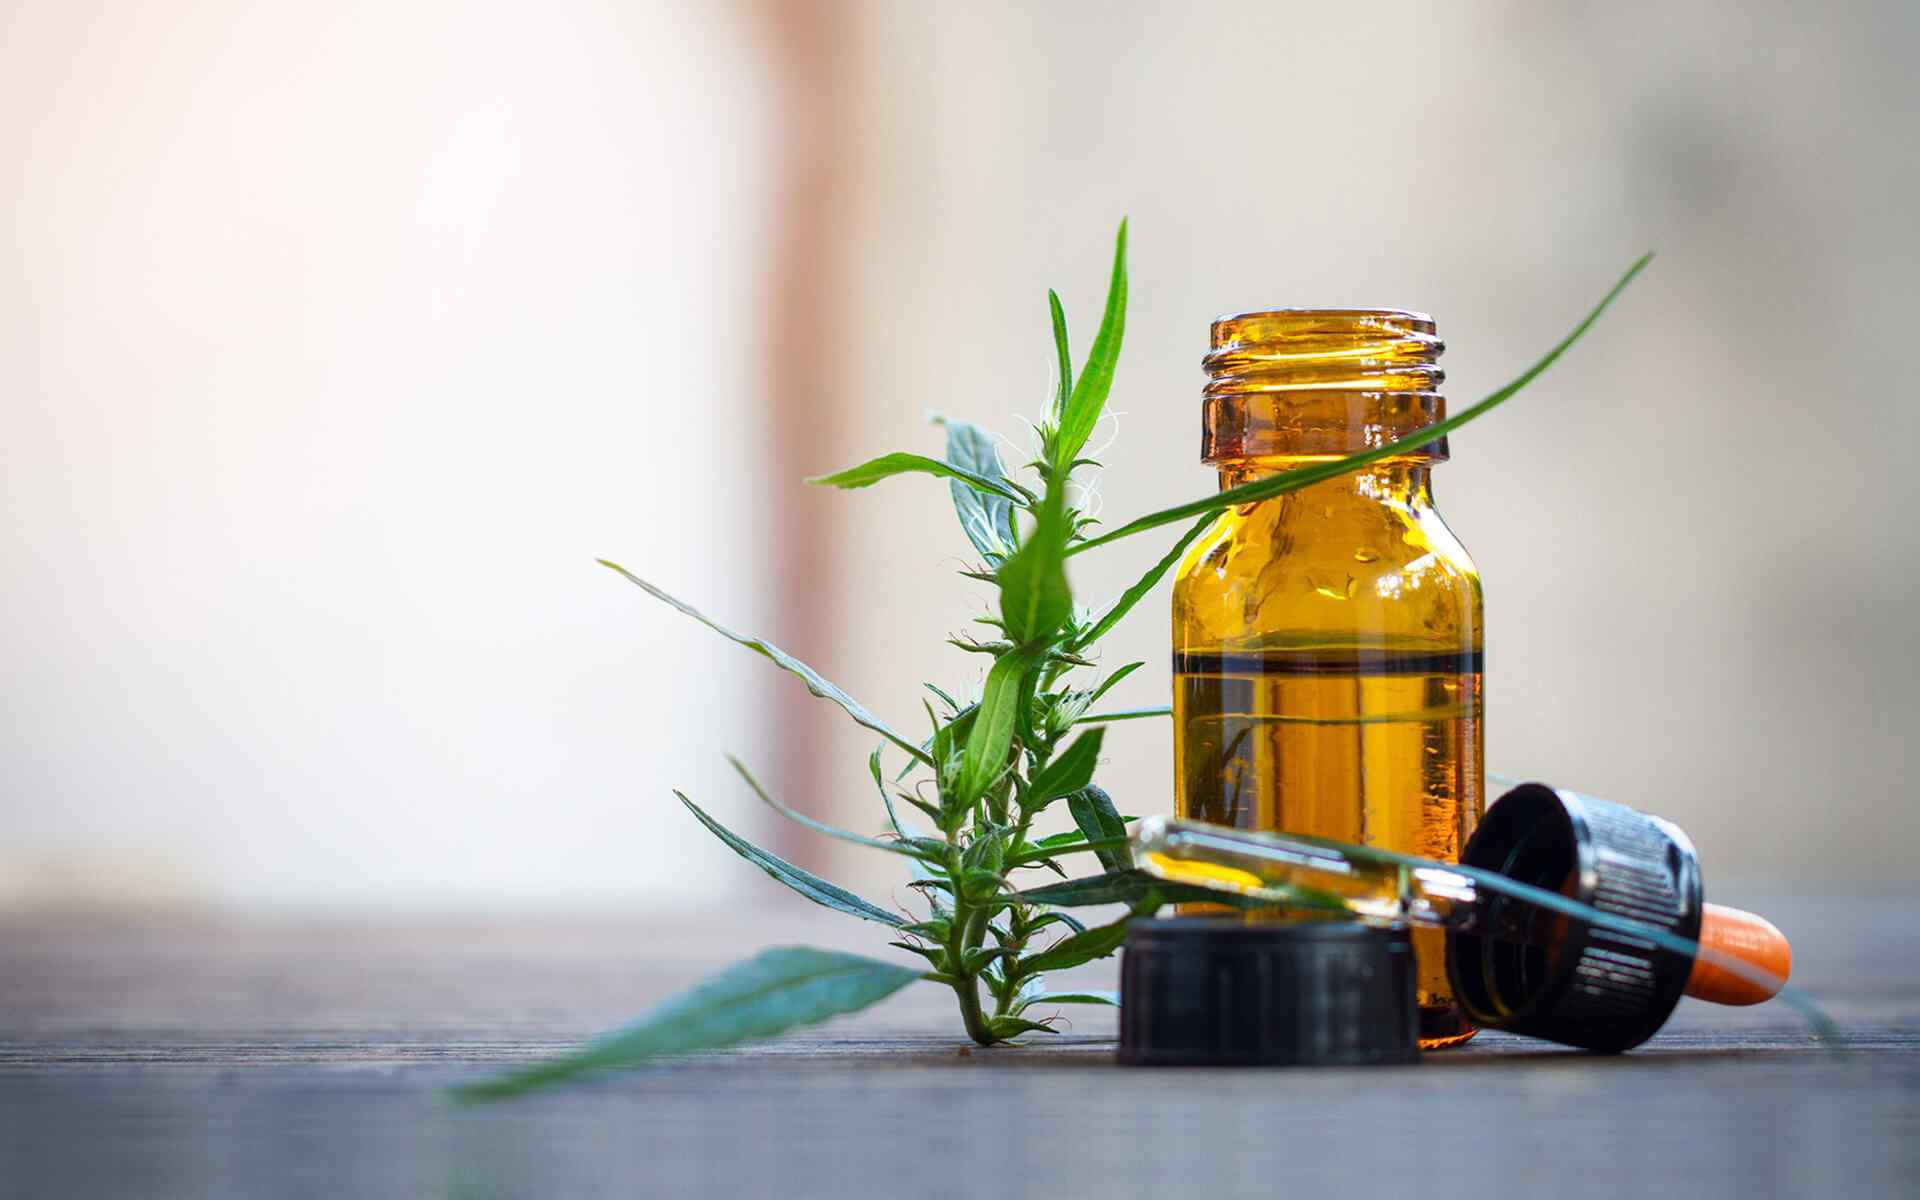 Medical Cannabis Tincture and Cannabis Leaf